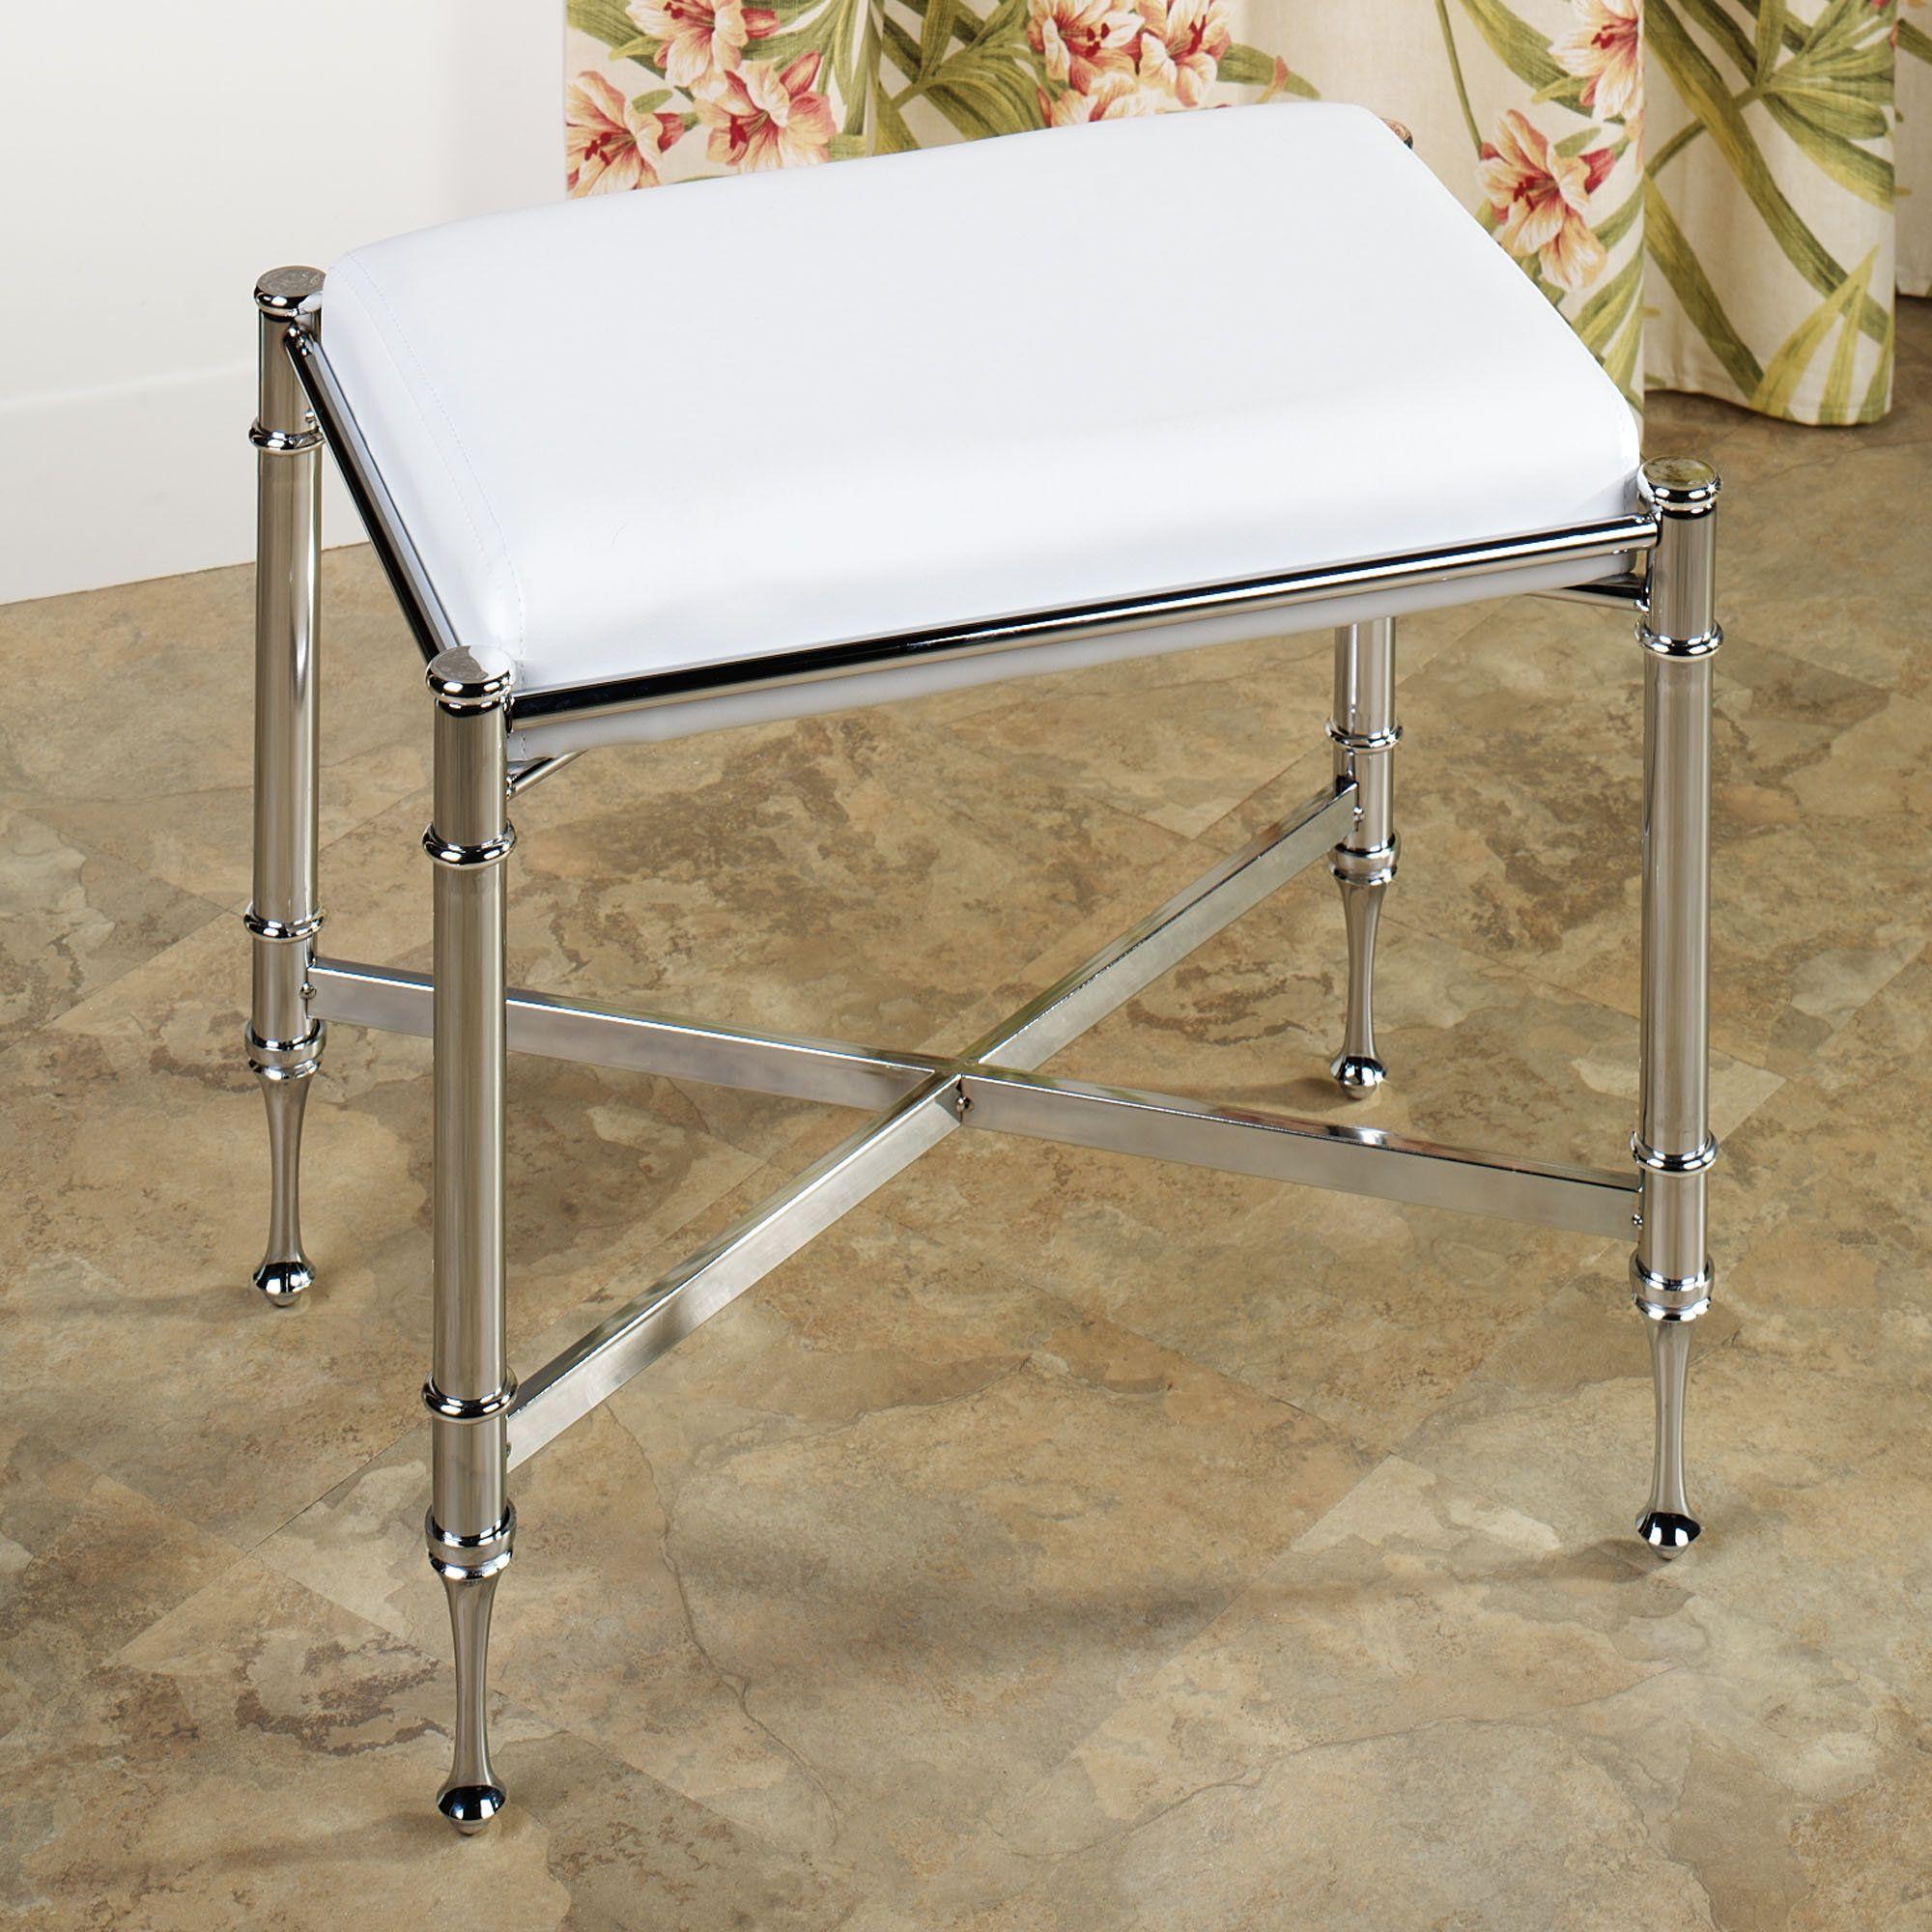 Estate Upholstered Vanity Bench | Vanity bench, Benches and Vanities